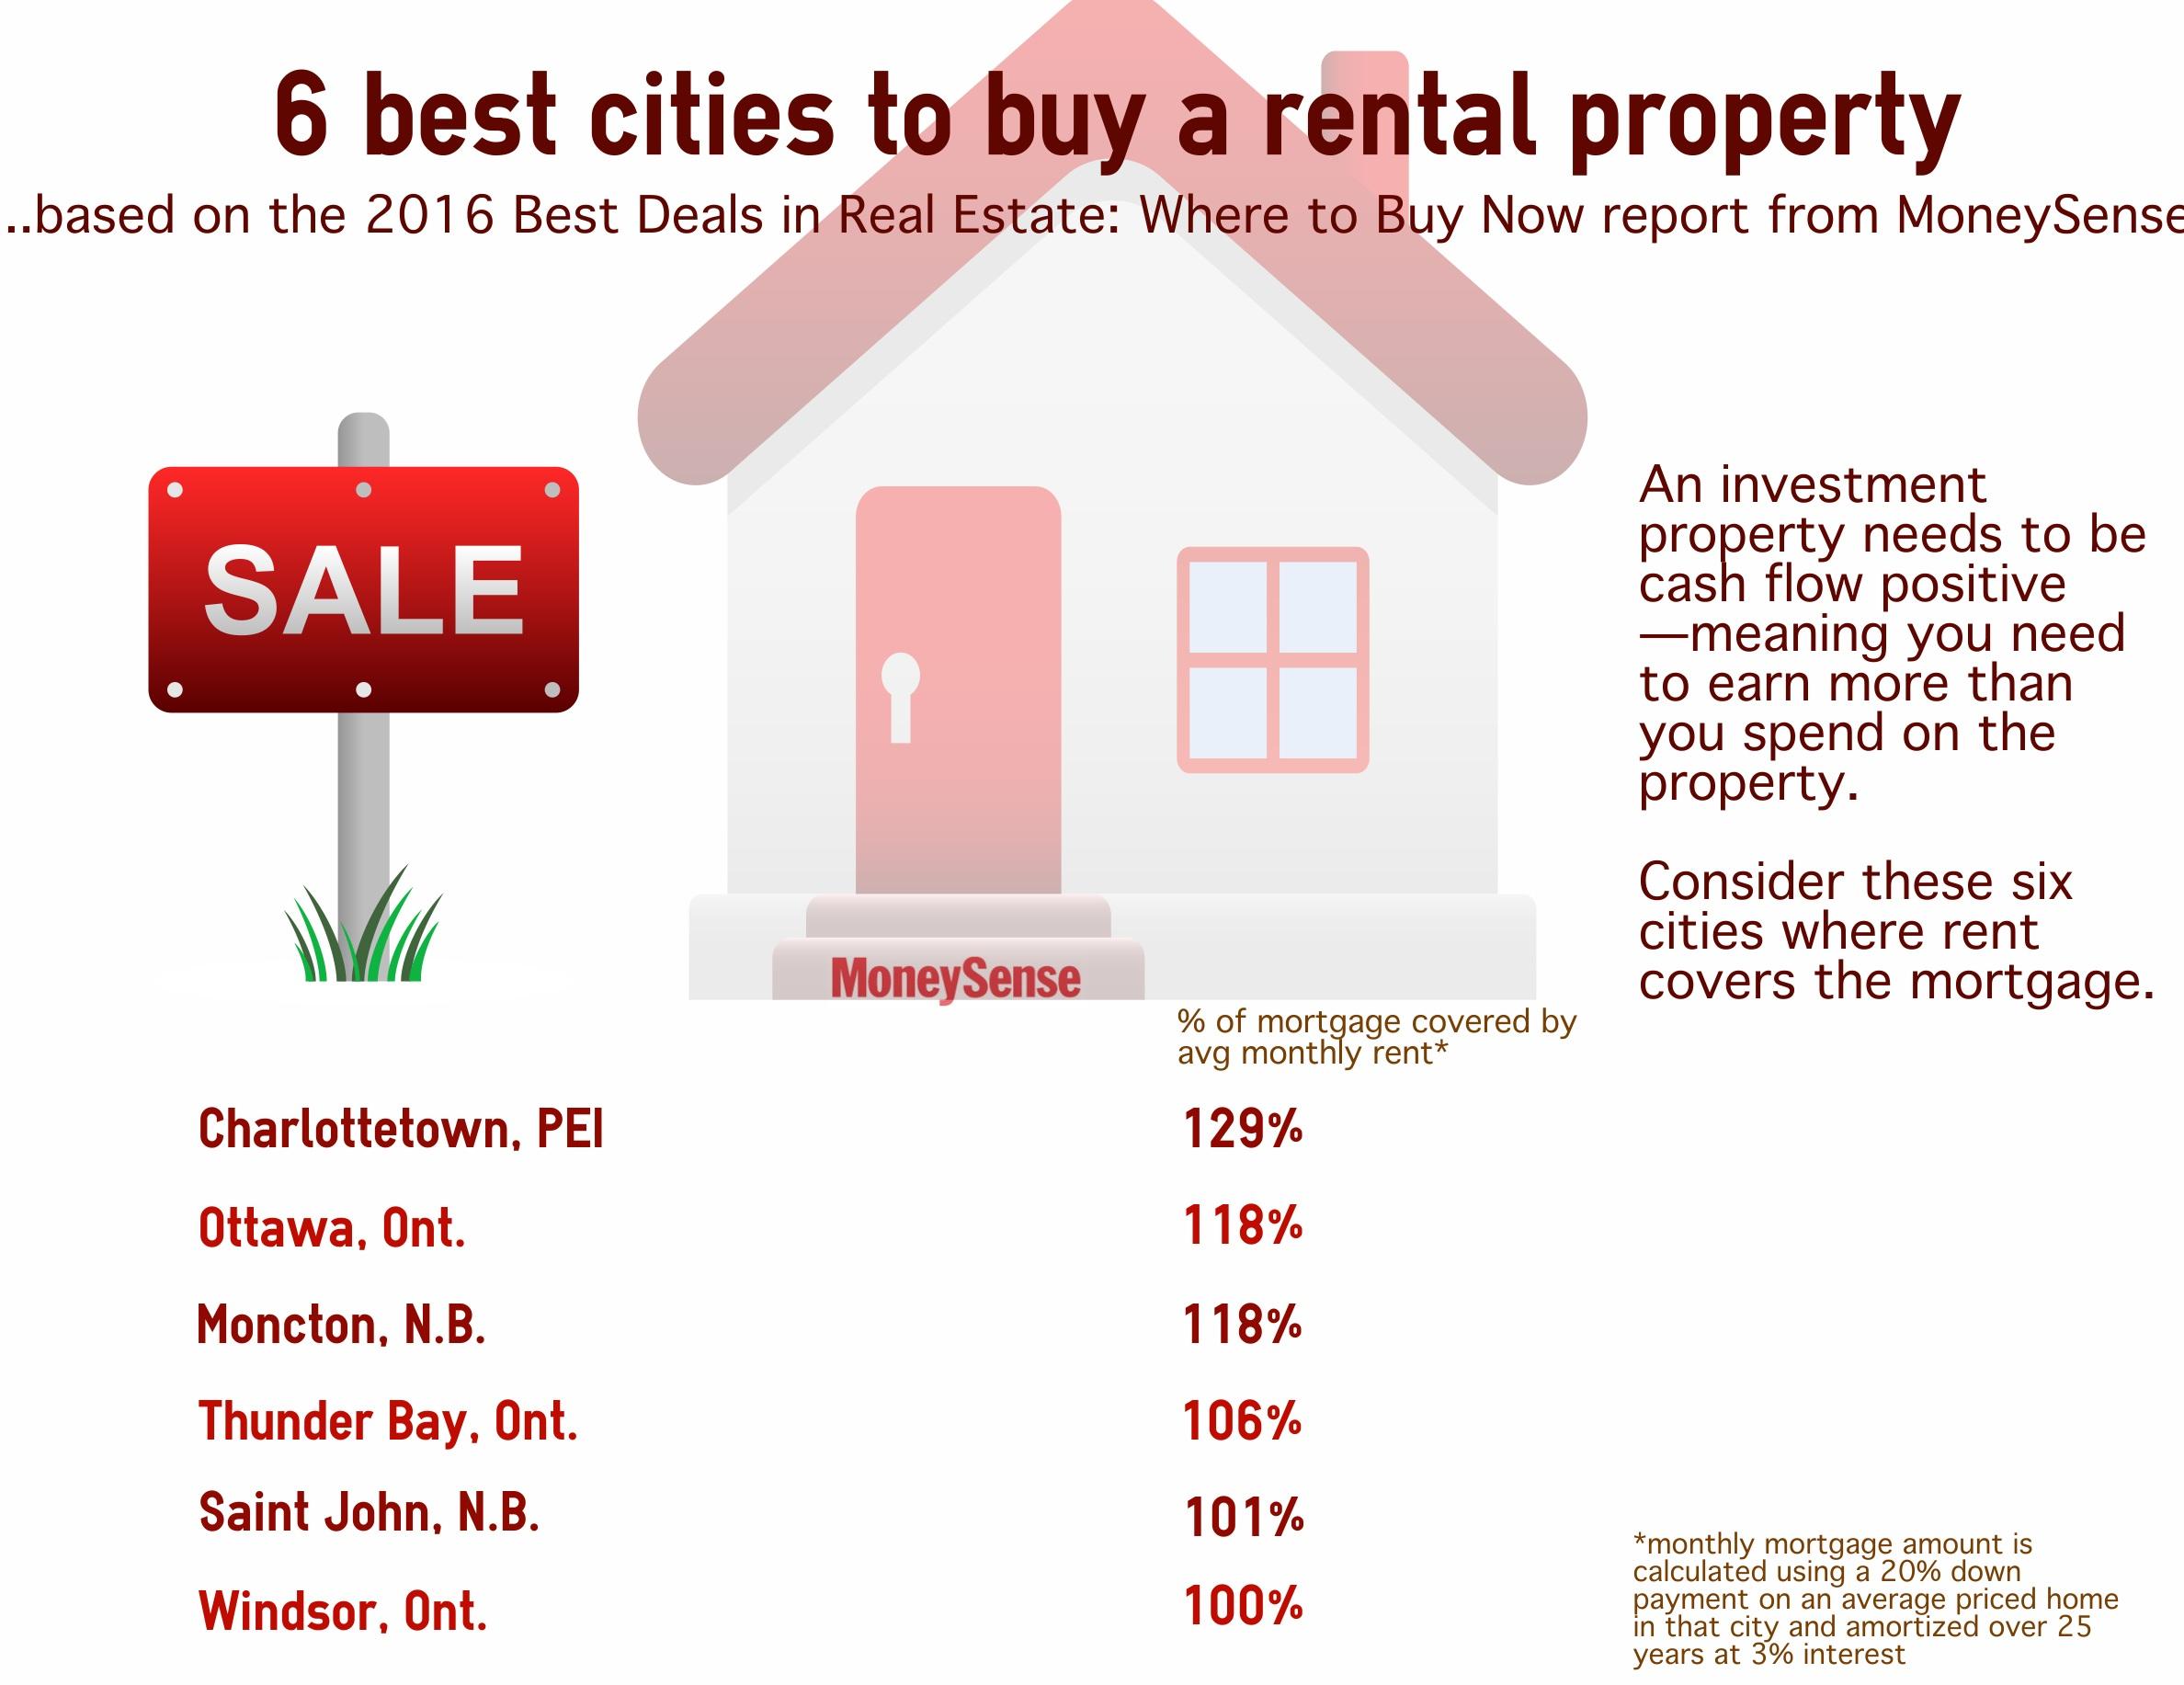 Best Deals in real estate 2016